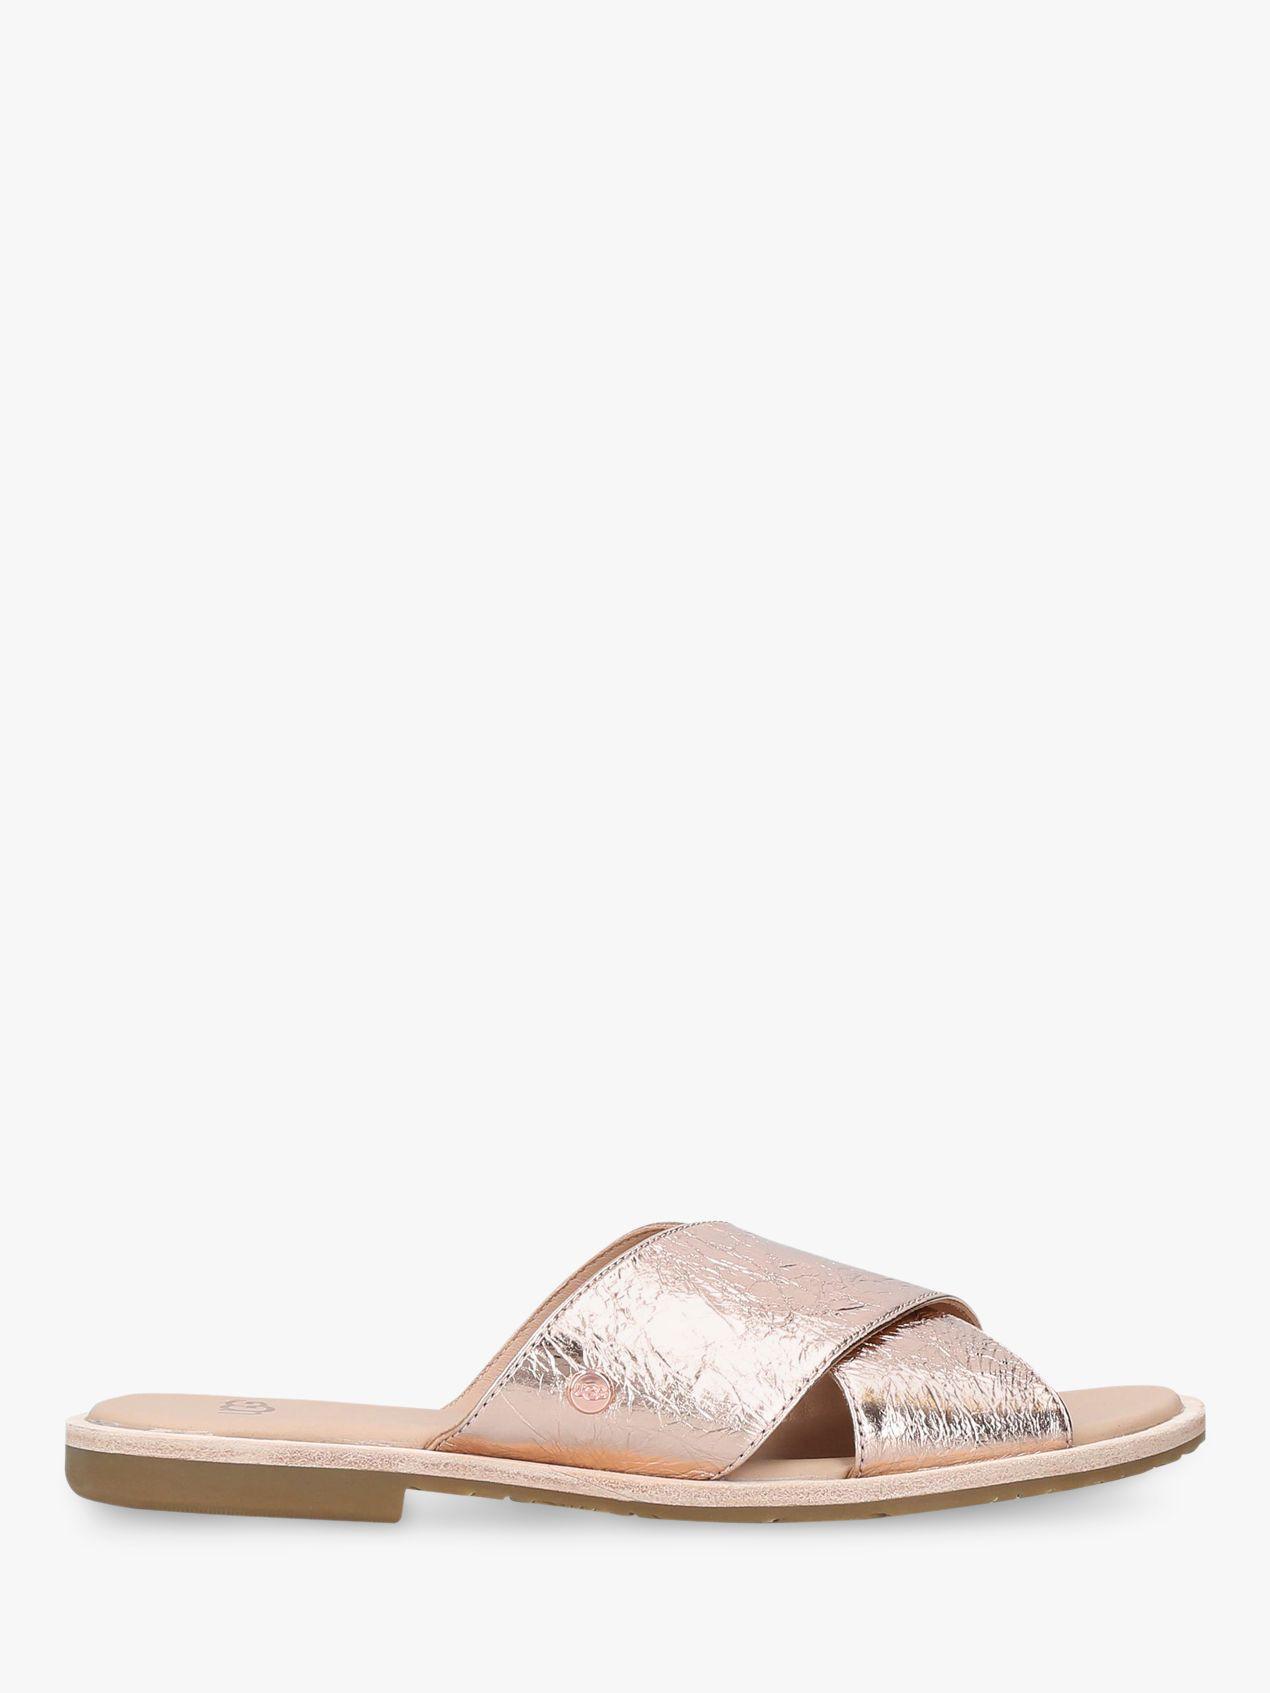 f4be7269224 UGG Joni Cross Strap Slip On Sandals - Lyst